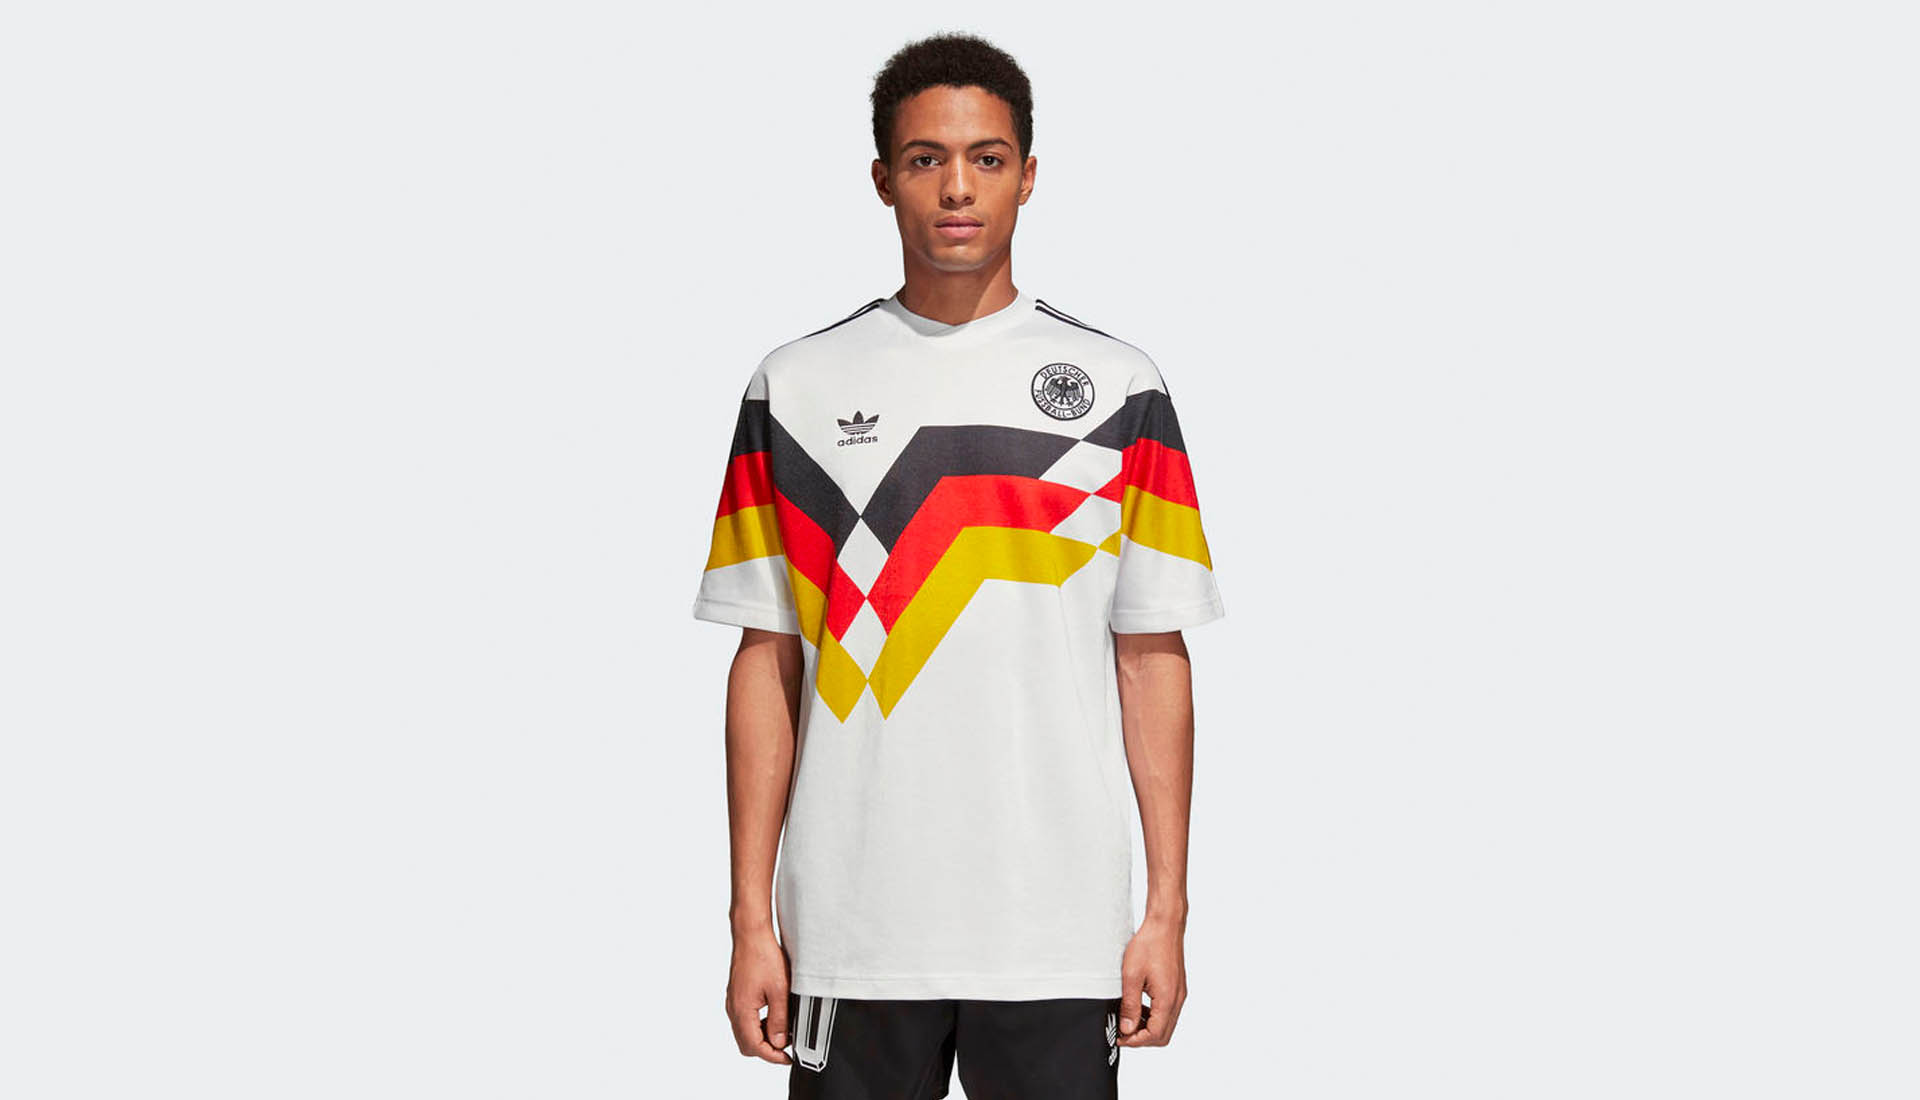 3984a5c1cd3 adidas Originals 2018 World Cup Jerseys - SoccerBible